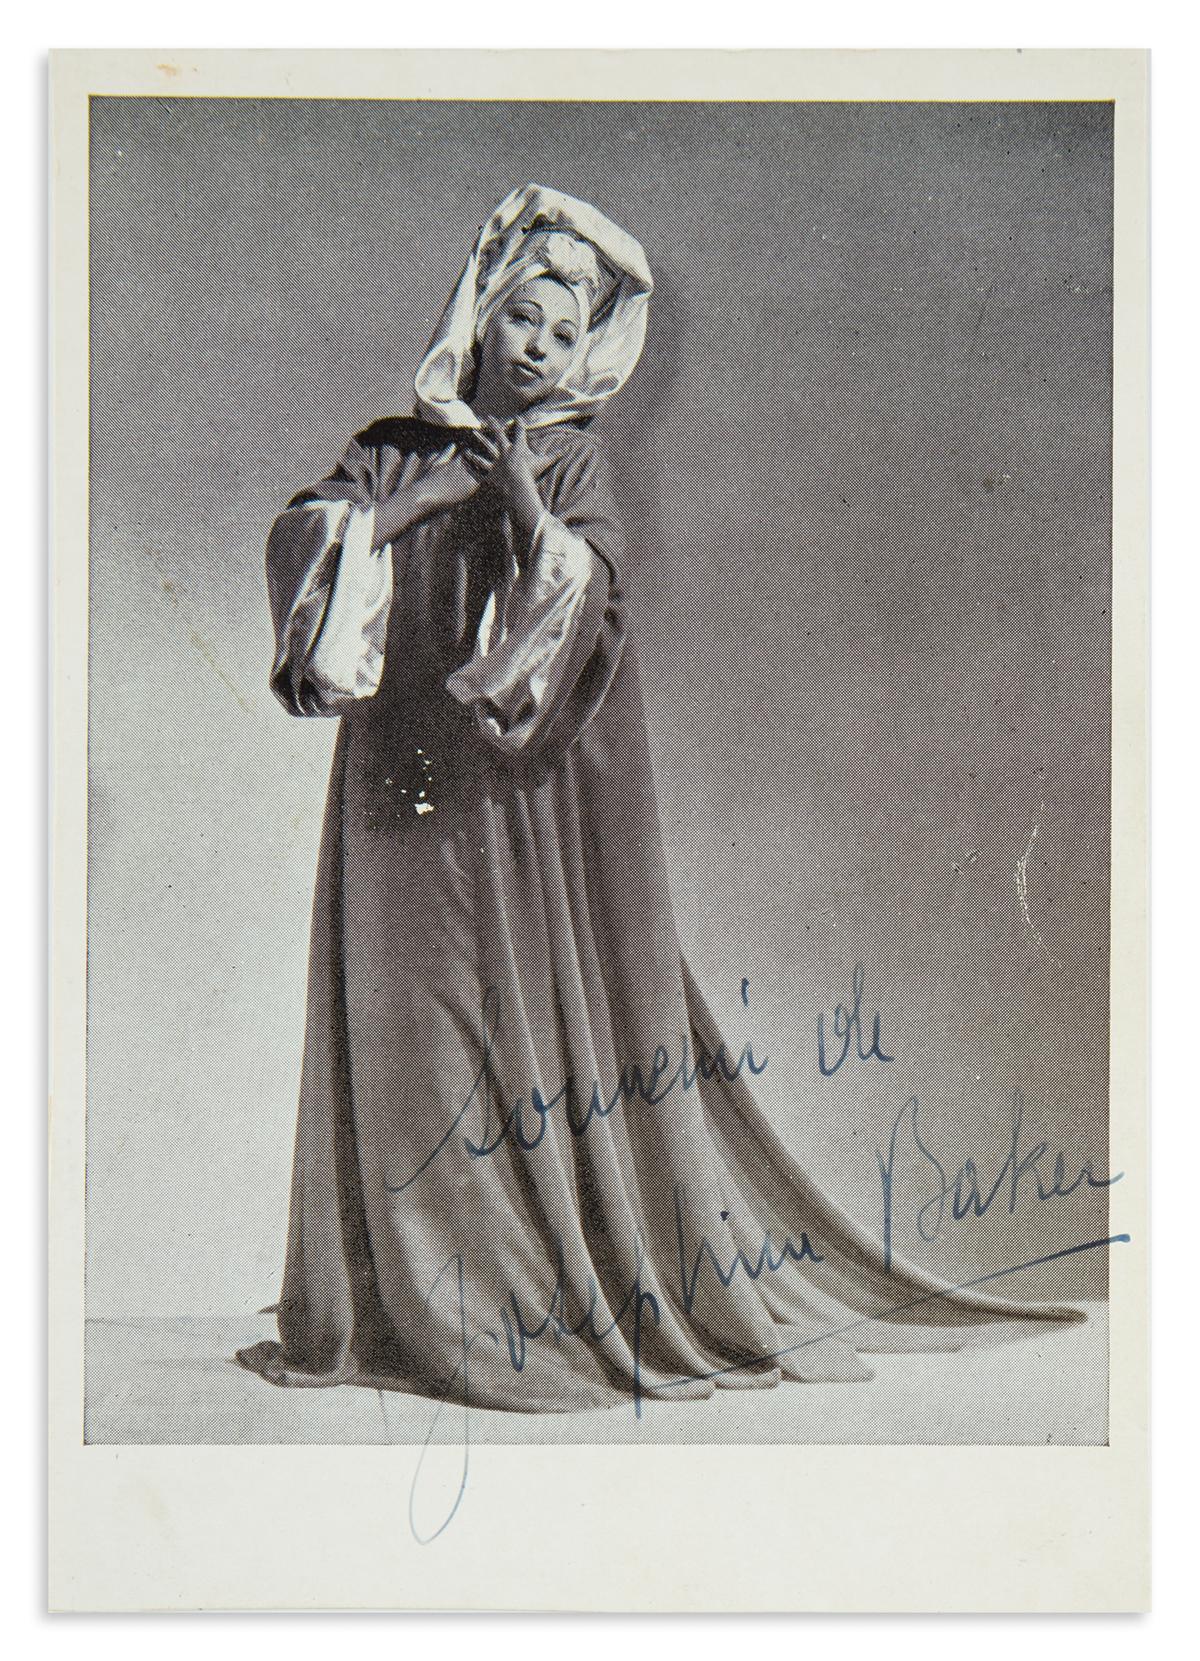 BAKER-JOSEPHINE-Photograph-Signed-and-Inscribed-Souvenir-de-